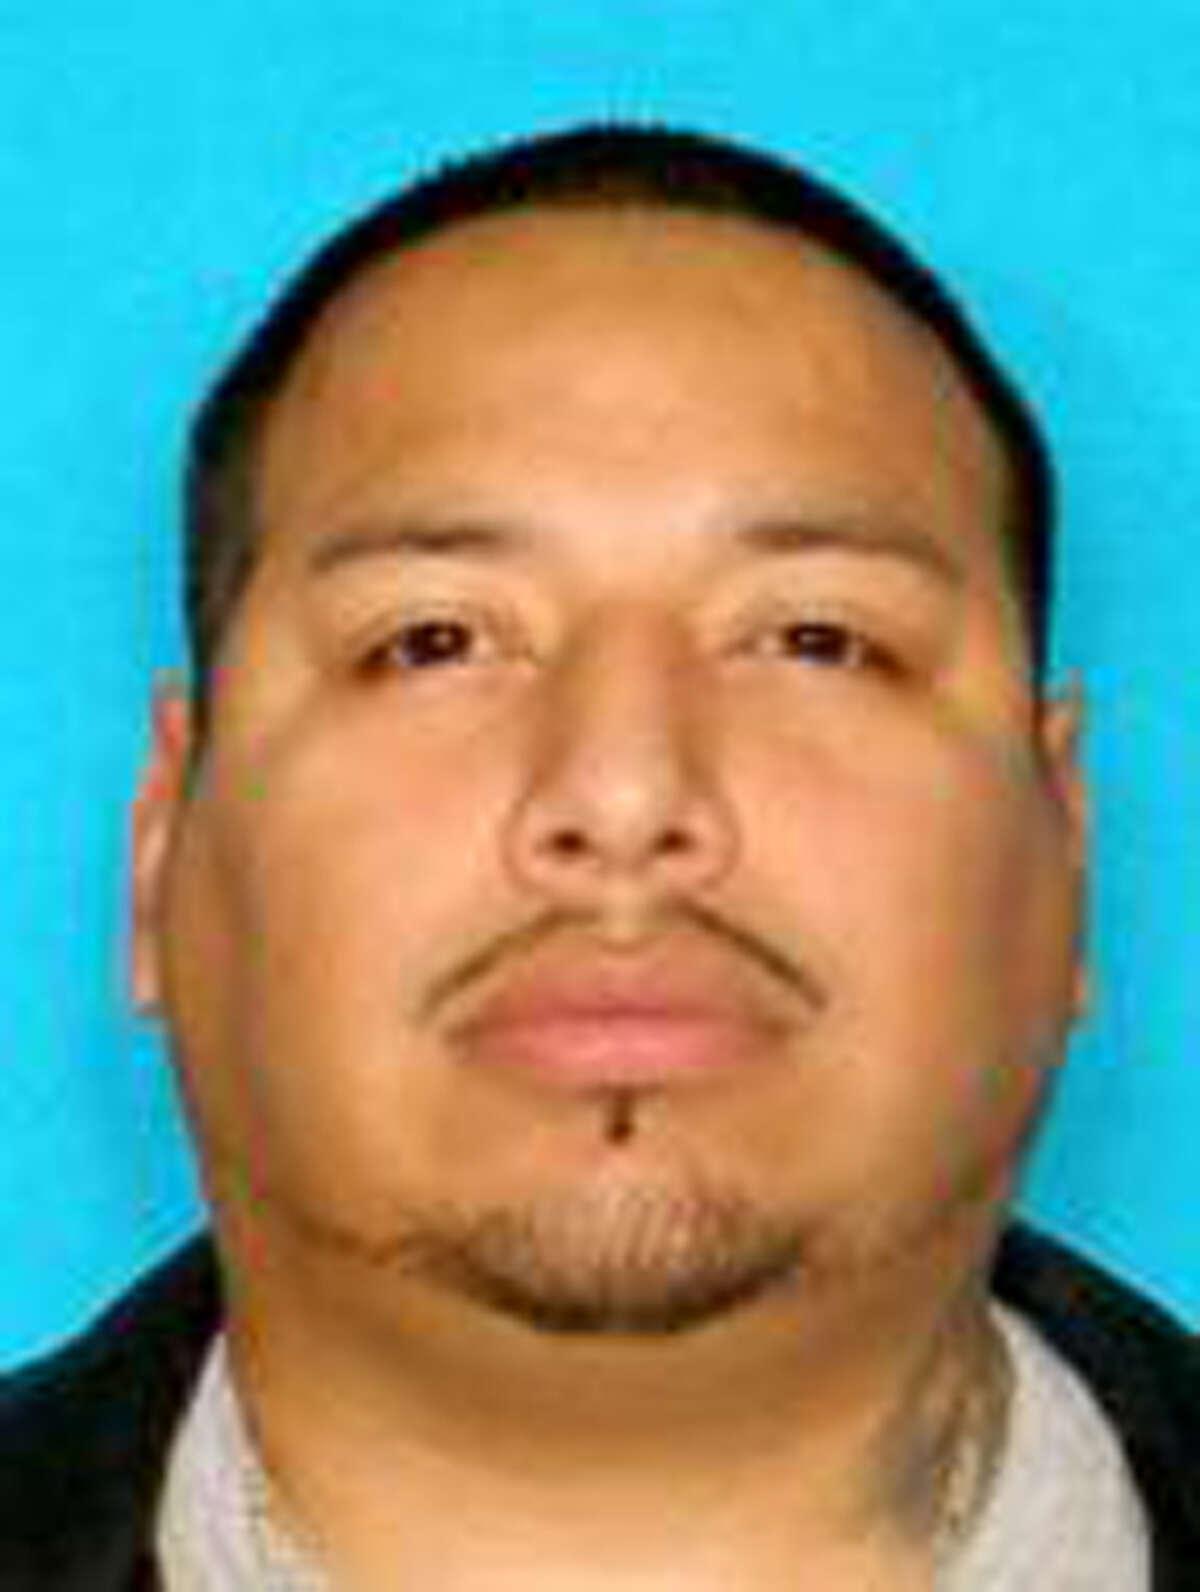 Jose Velez, third suspect in the murder of Juan Romero. Courtesy/San Antonio Police Department